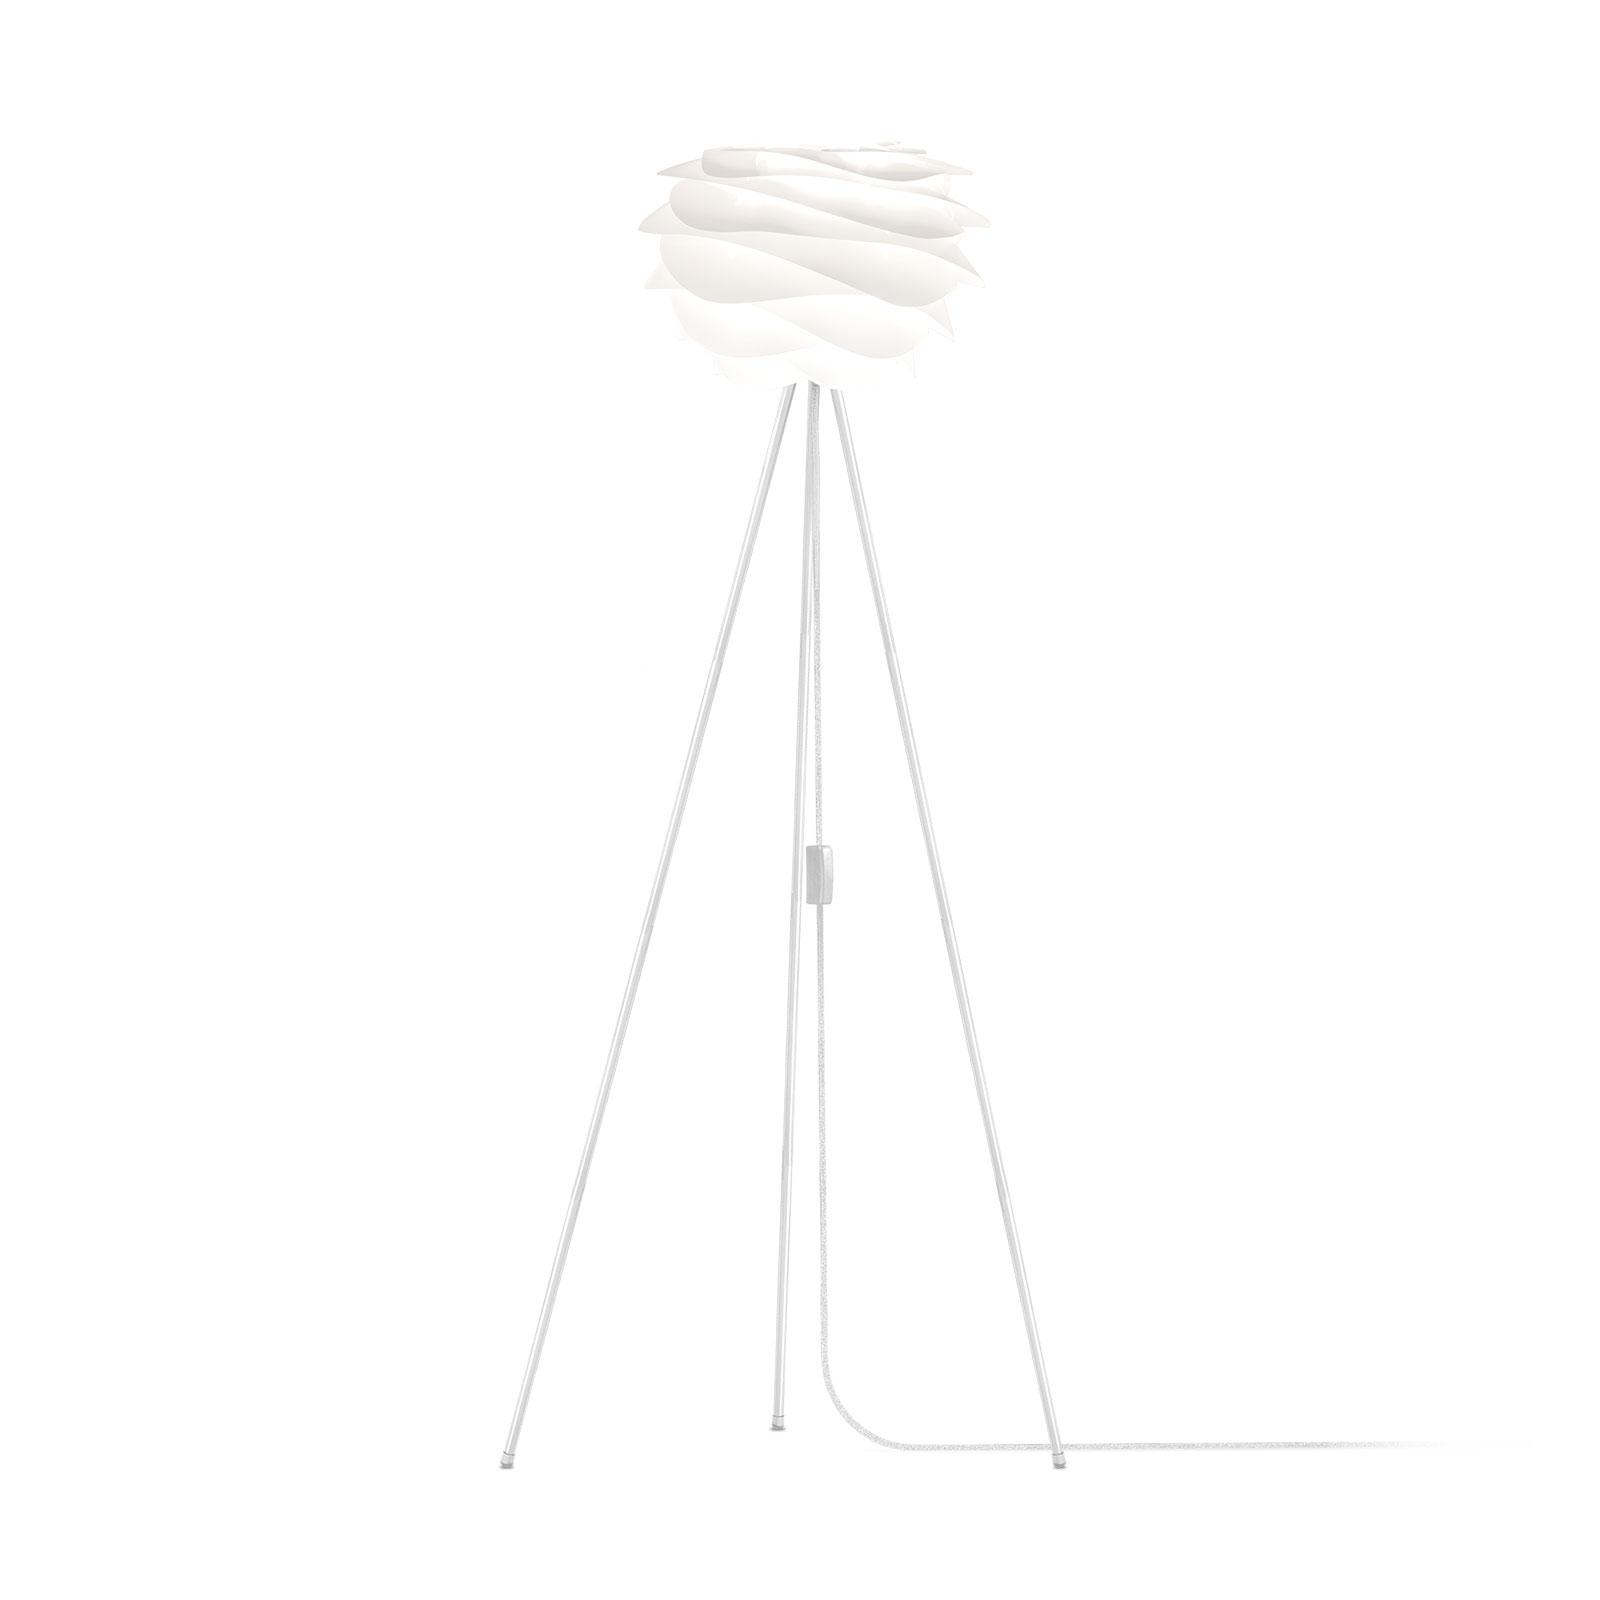 UMAGE Carmina Mini vloerlamp wit/tripod wit